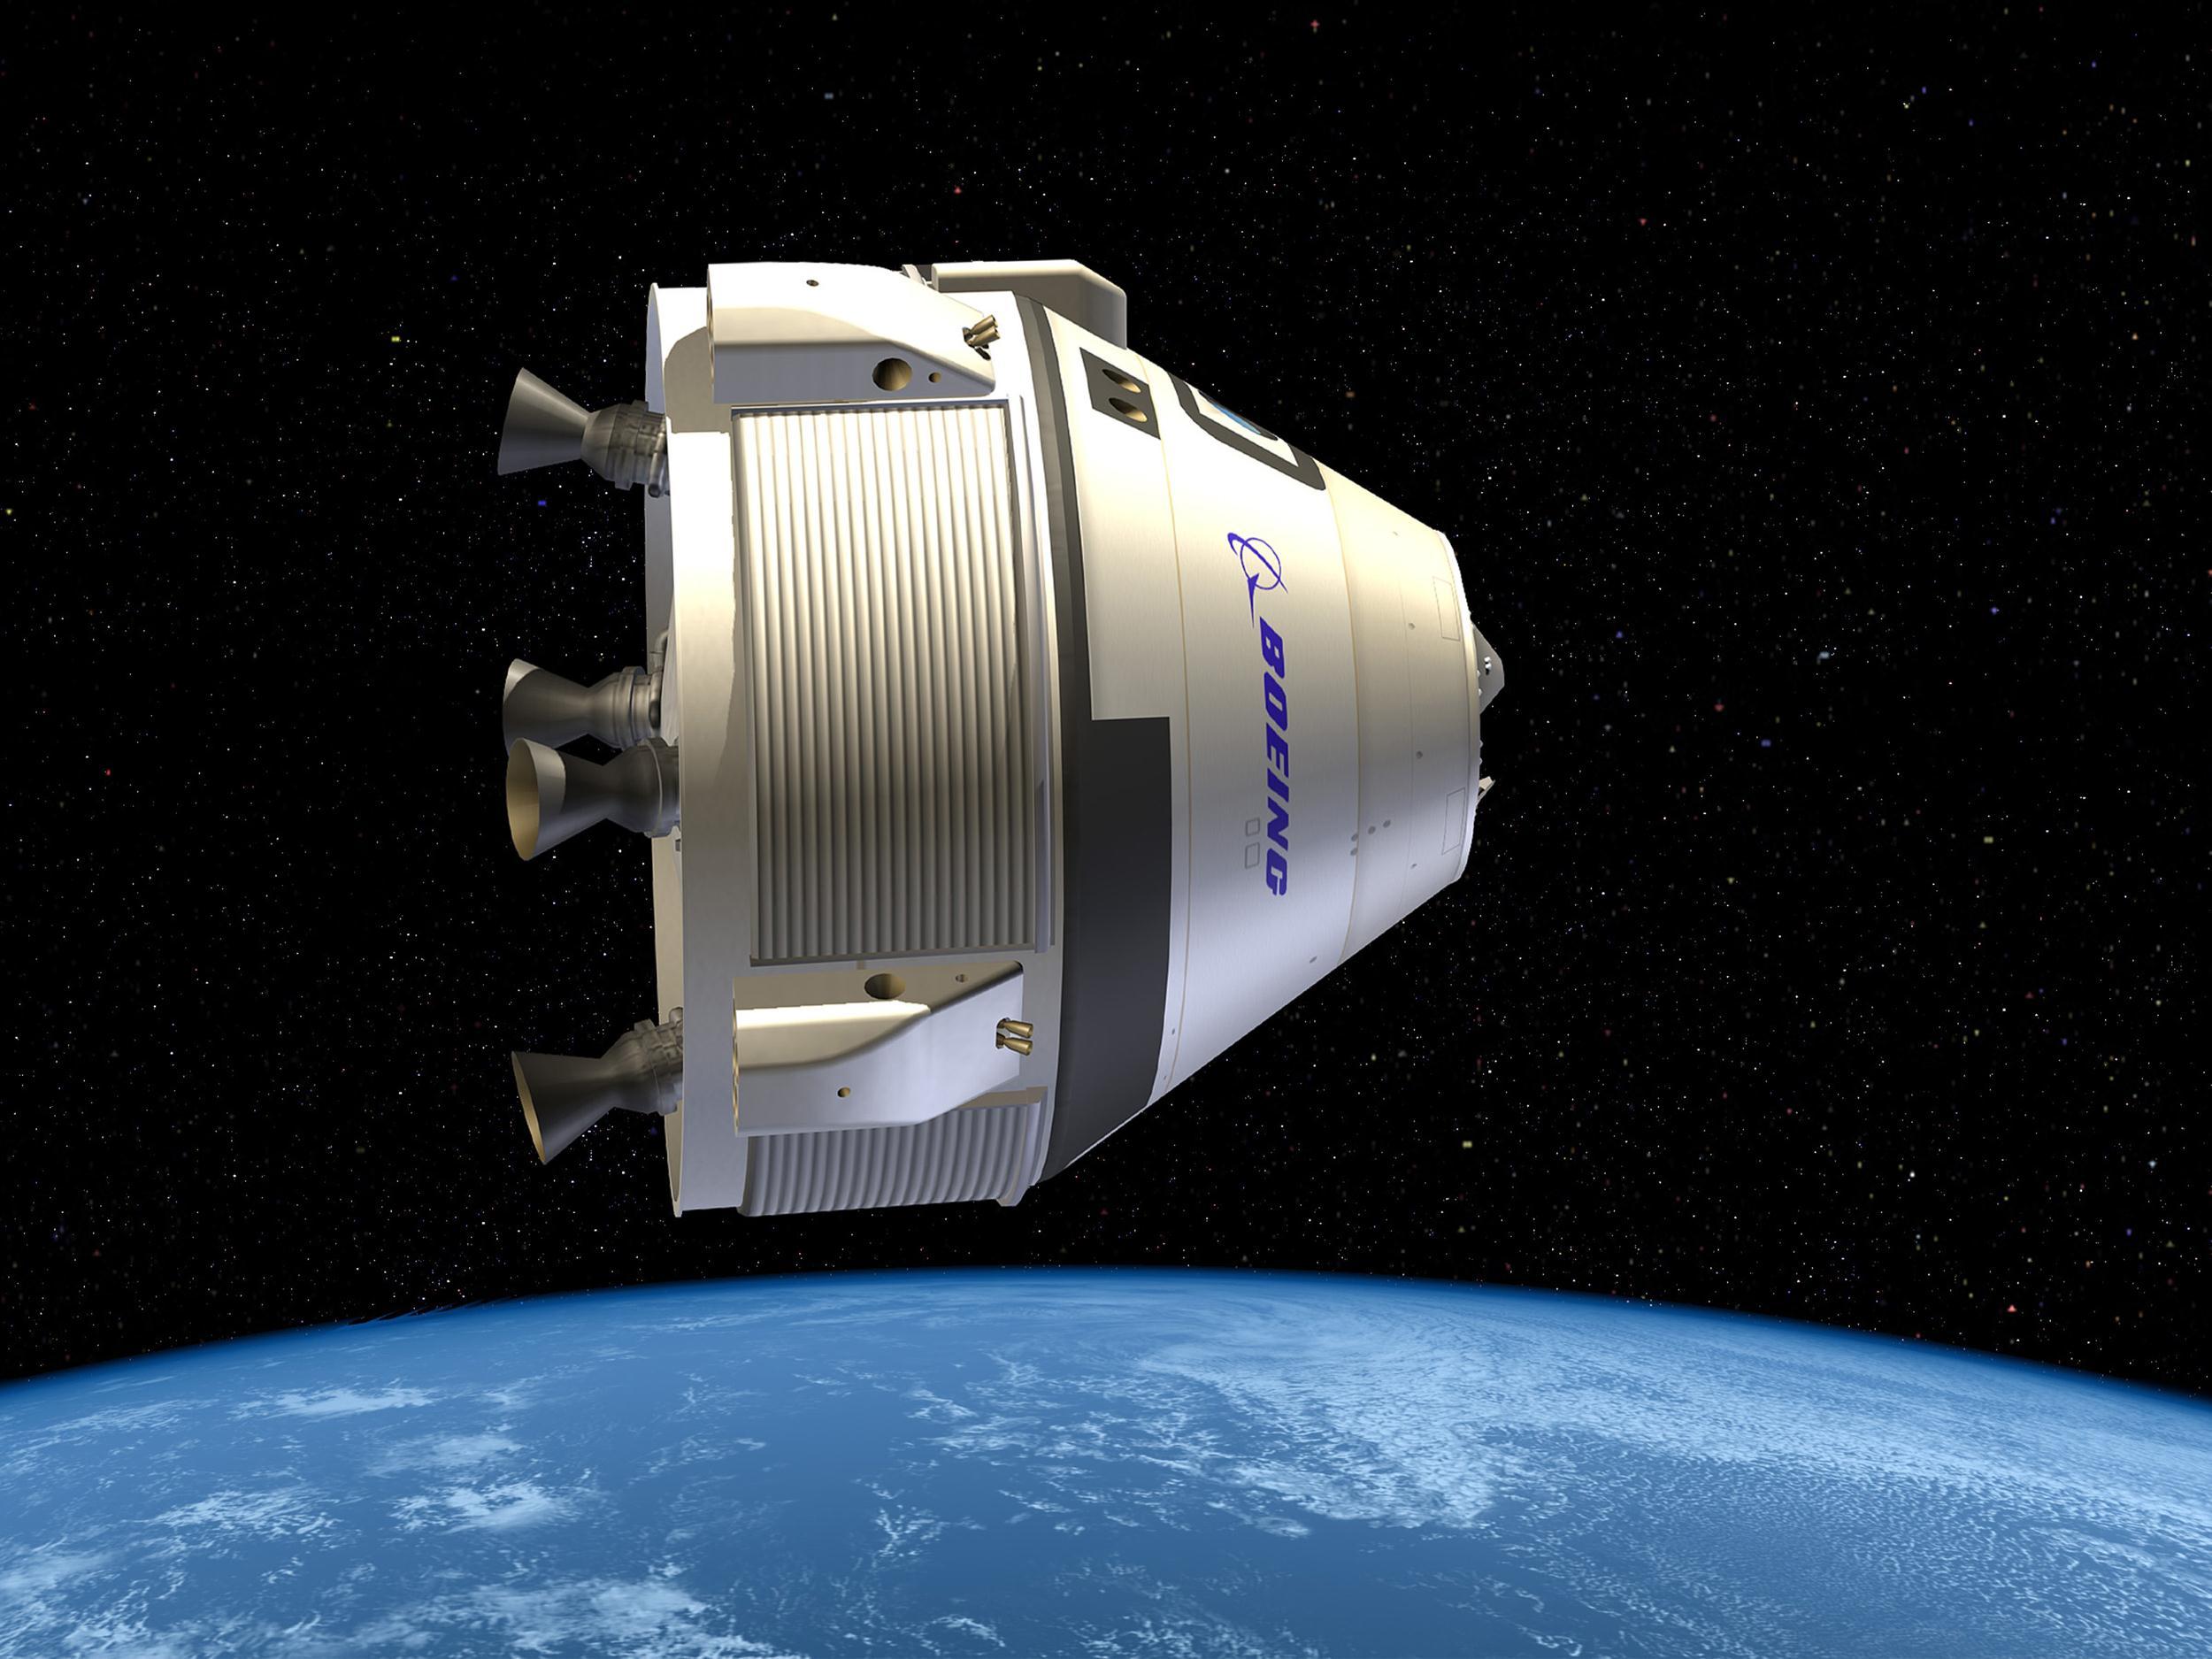 boeing space program - photo #4